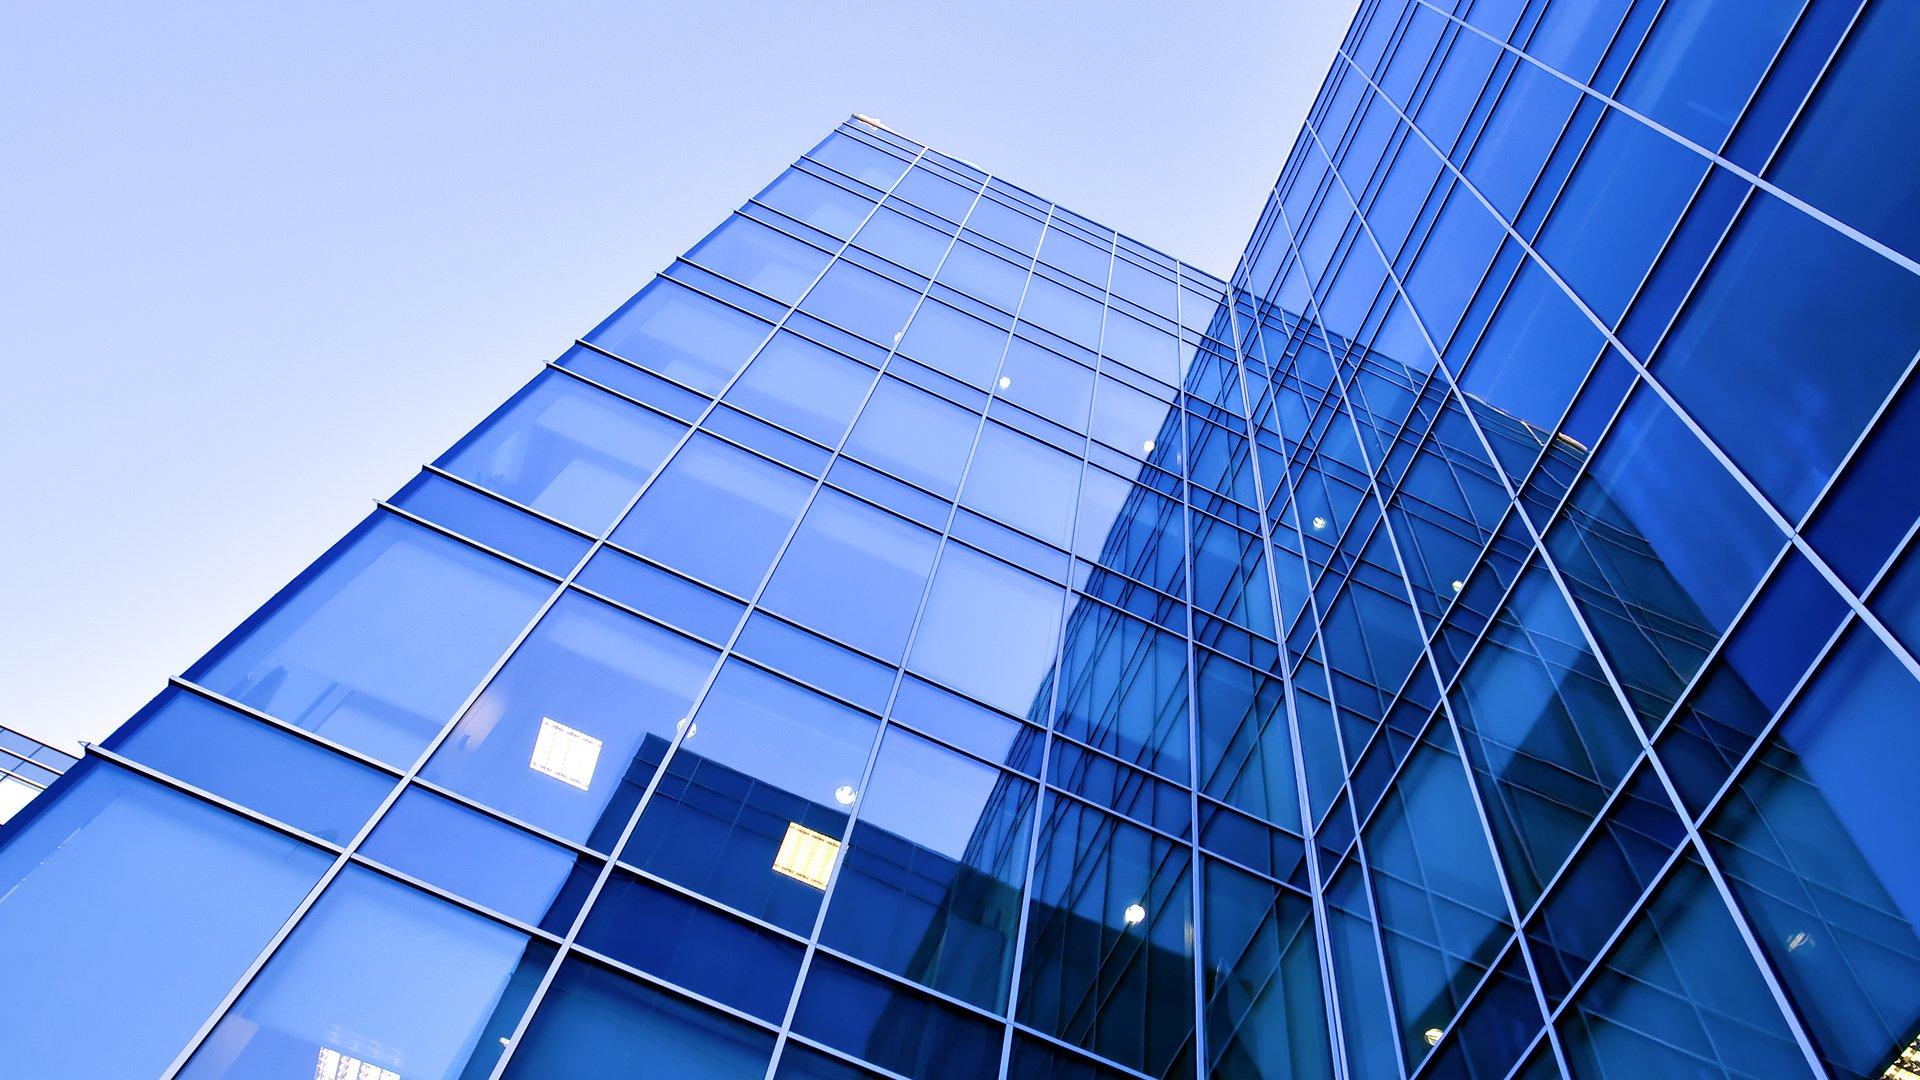 Glass windowed building